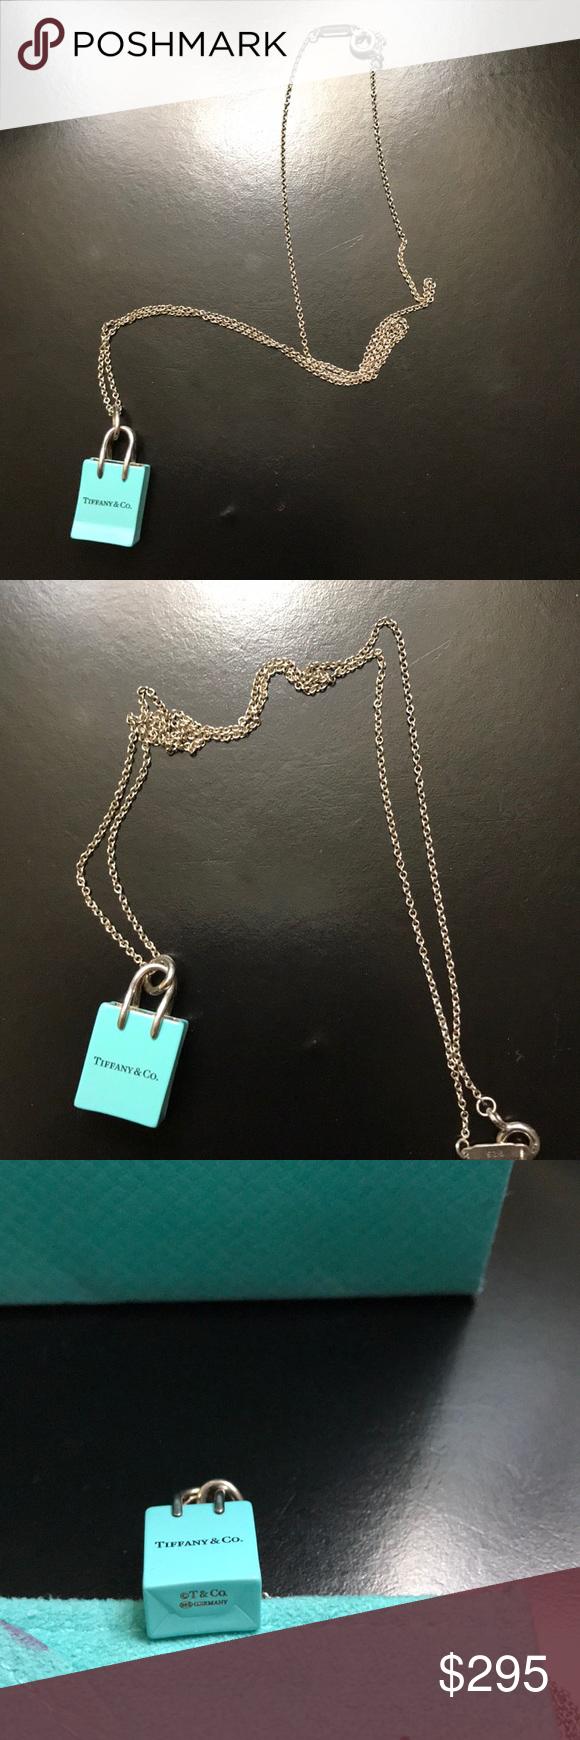 3f8a23c892 Authentic Tiffany&Co. Shopping Bag Charm and Chain EUC! Iconic shopping bag  charm with Tiffany